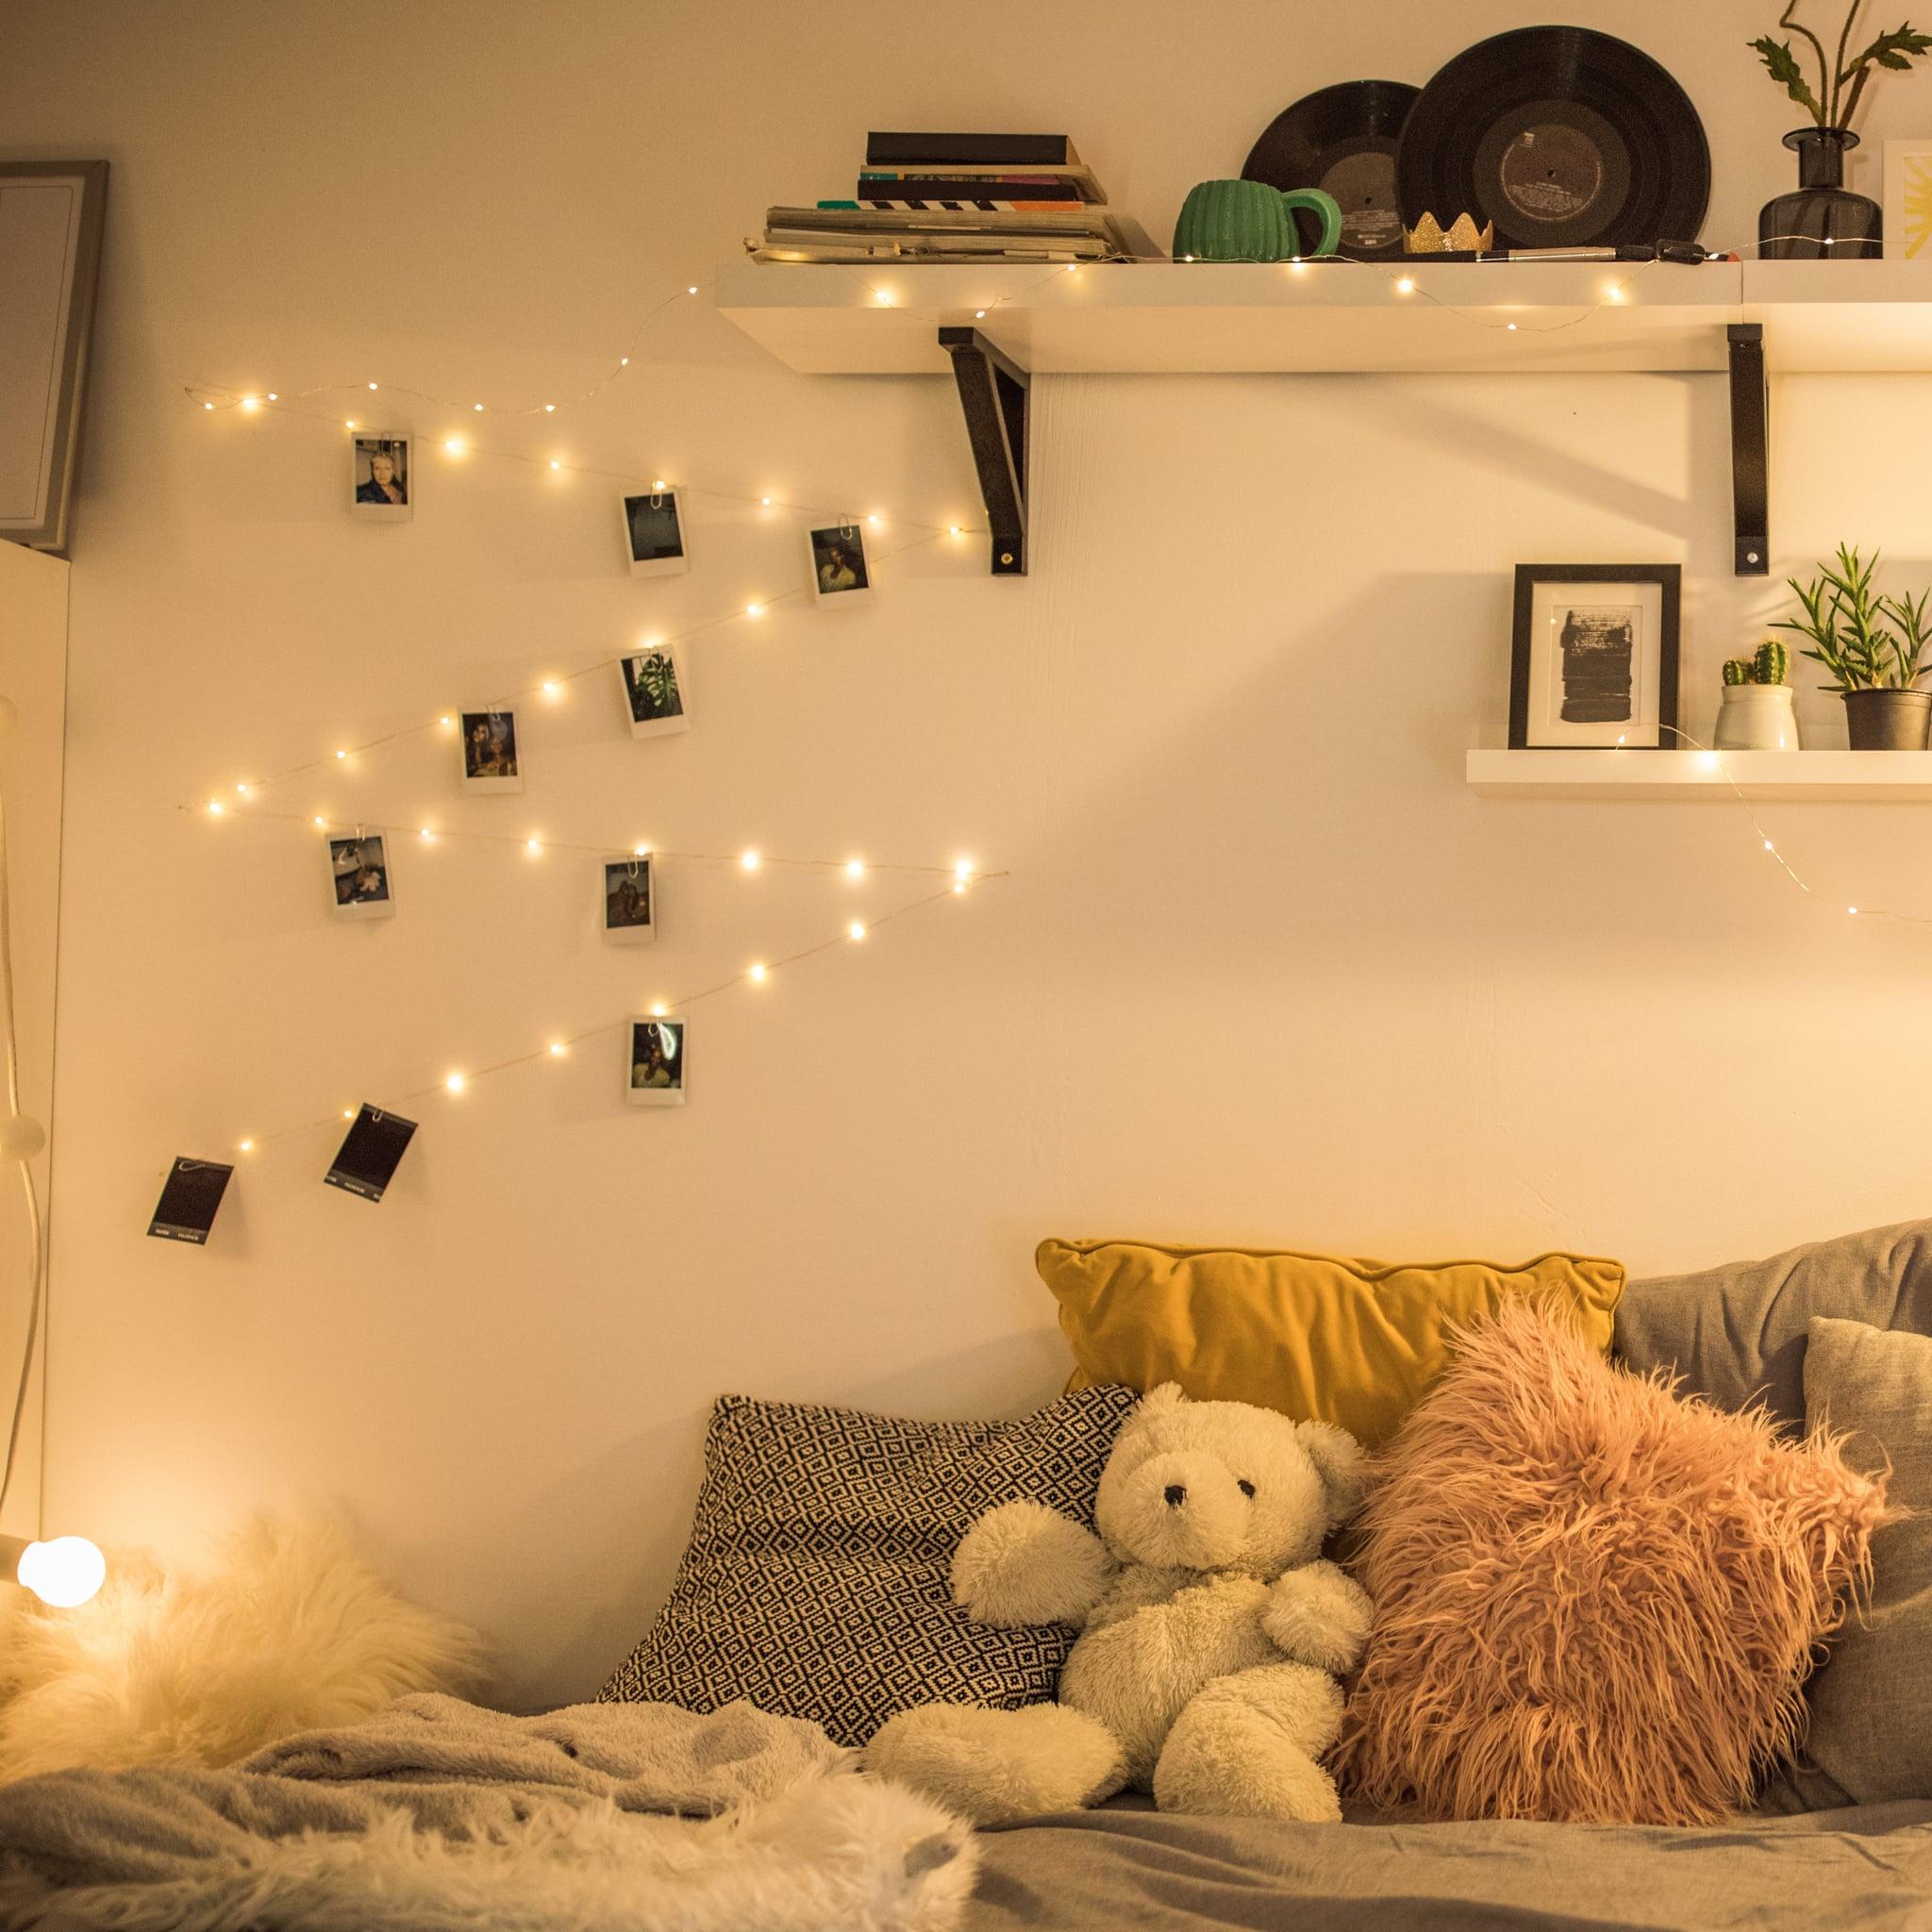 Diy Christmas Light Ideas For Year Round Decorating Popsugar Smart Living